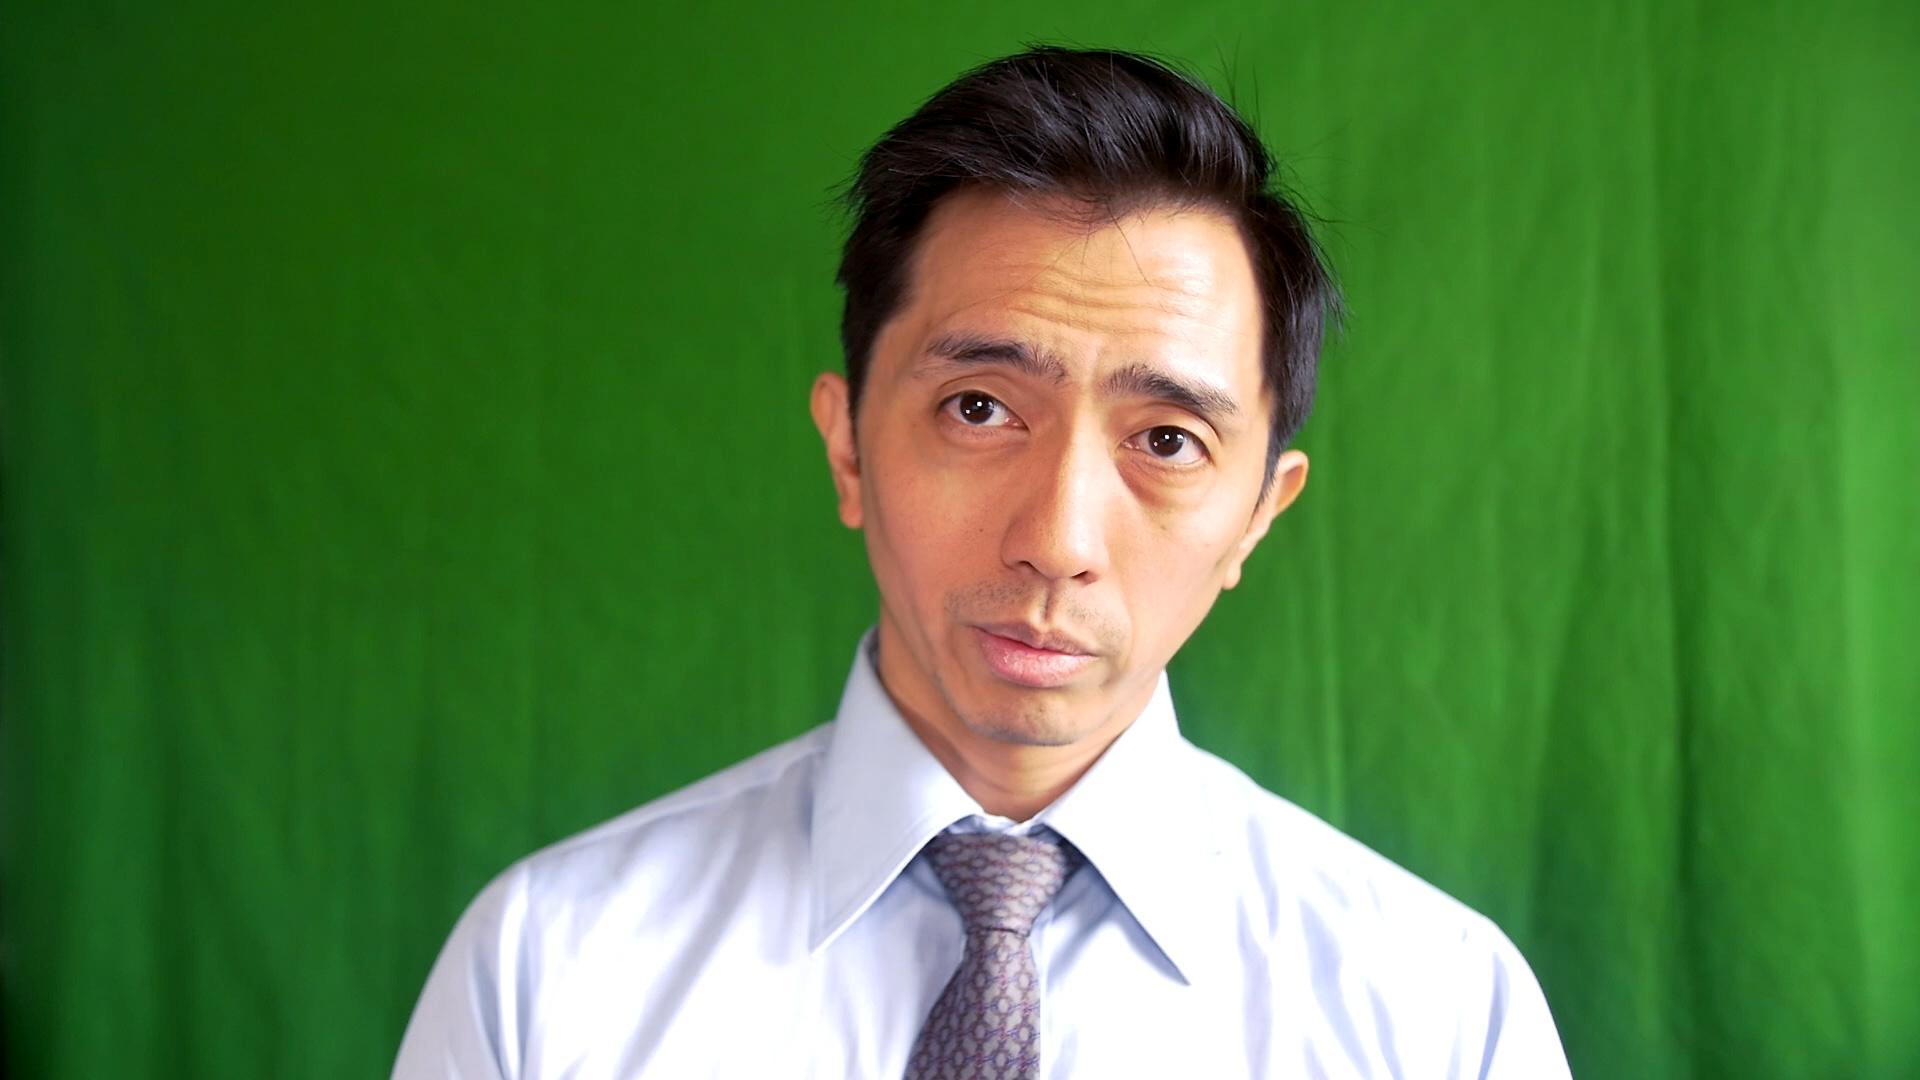 Vincent_Veloso_detective_greenscreen